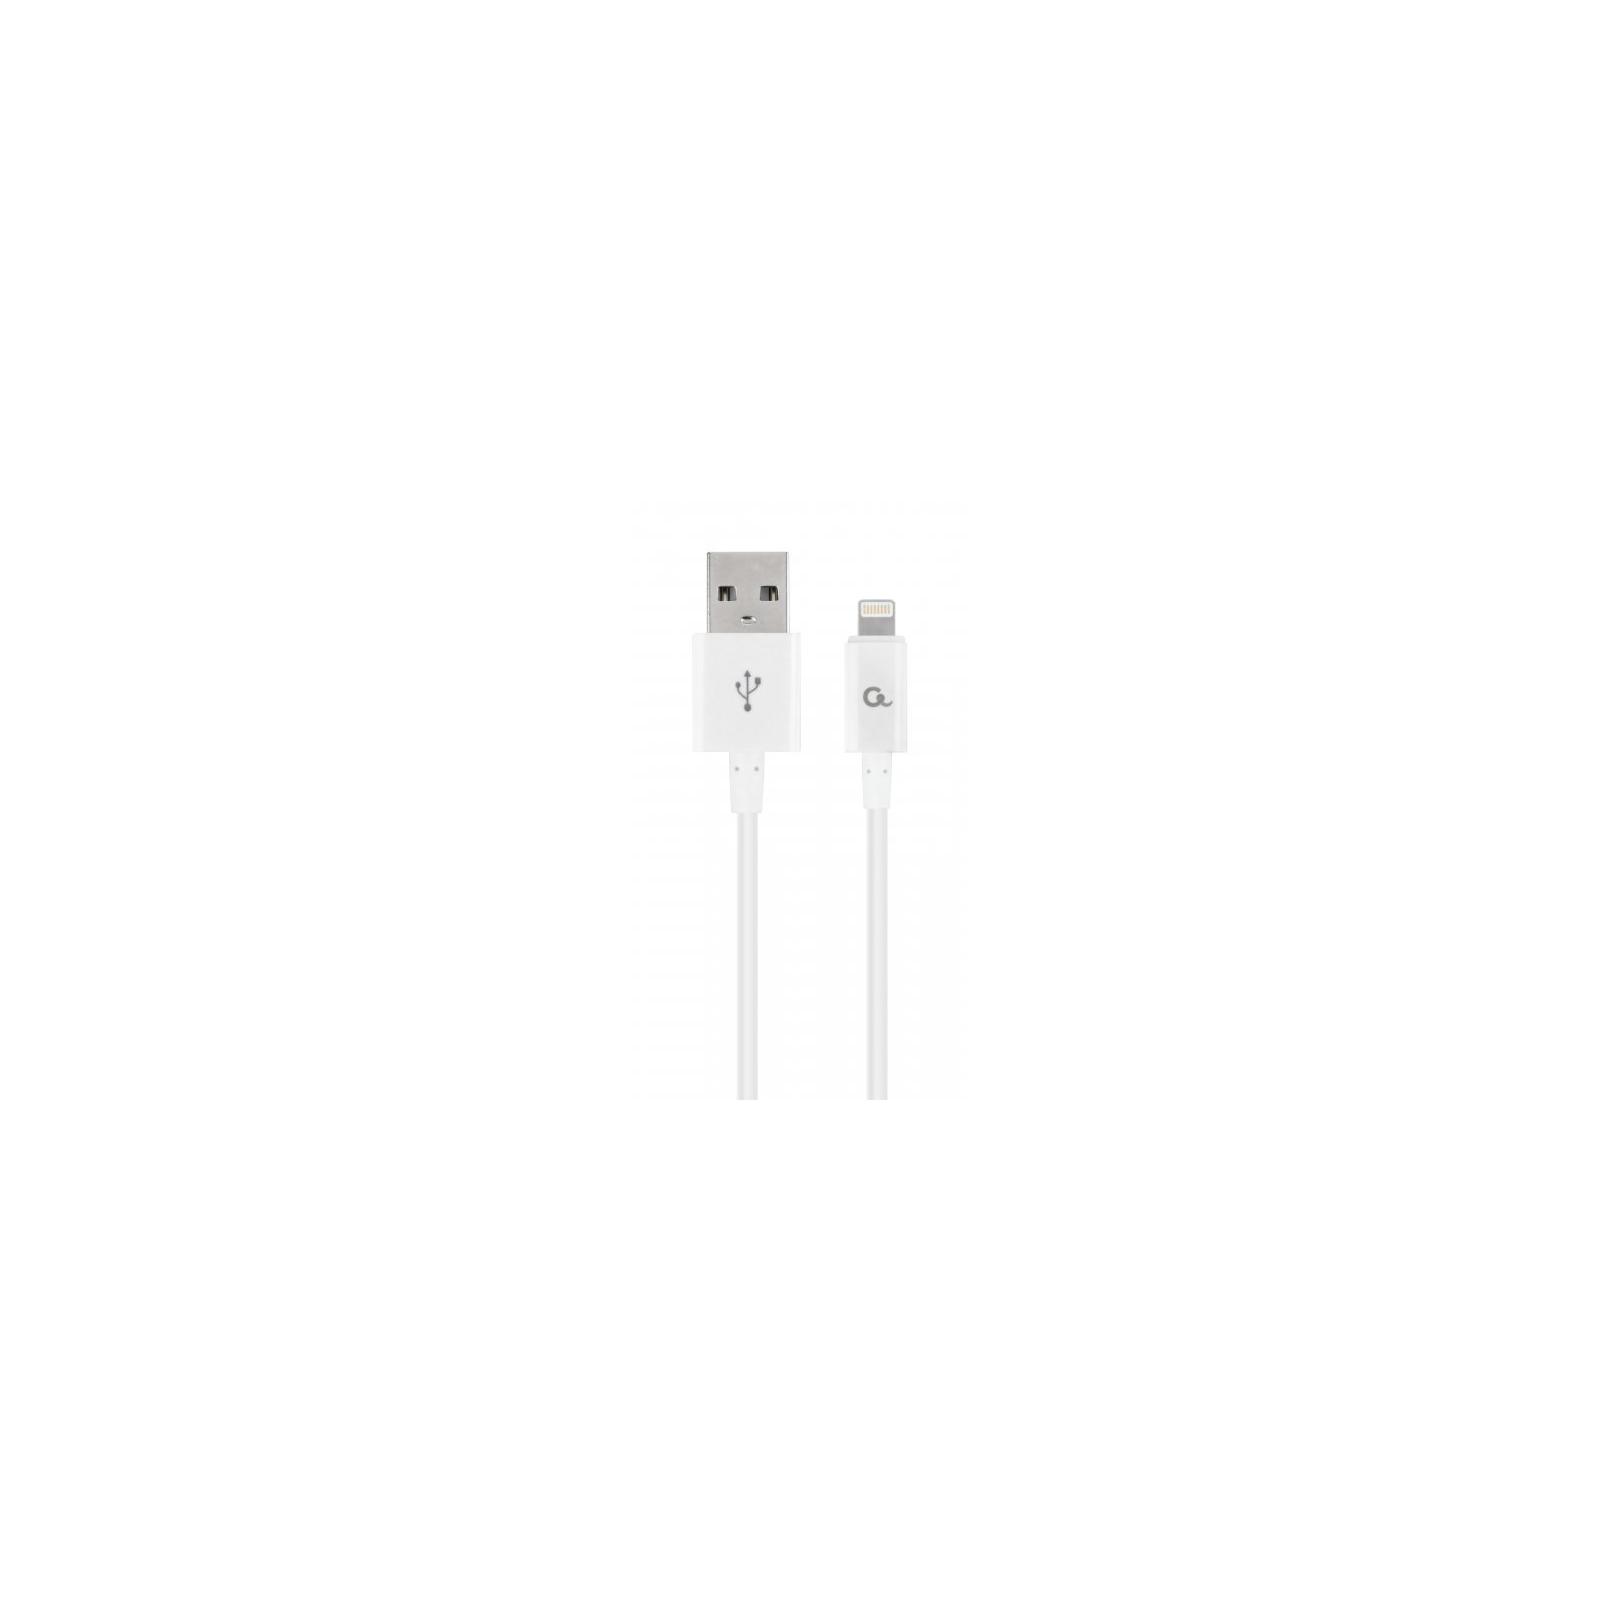 Дата кабель USB 2.0 AM to Lightning 1.0m Cablexpert (CC-USB2P-AMLM-1M)